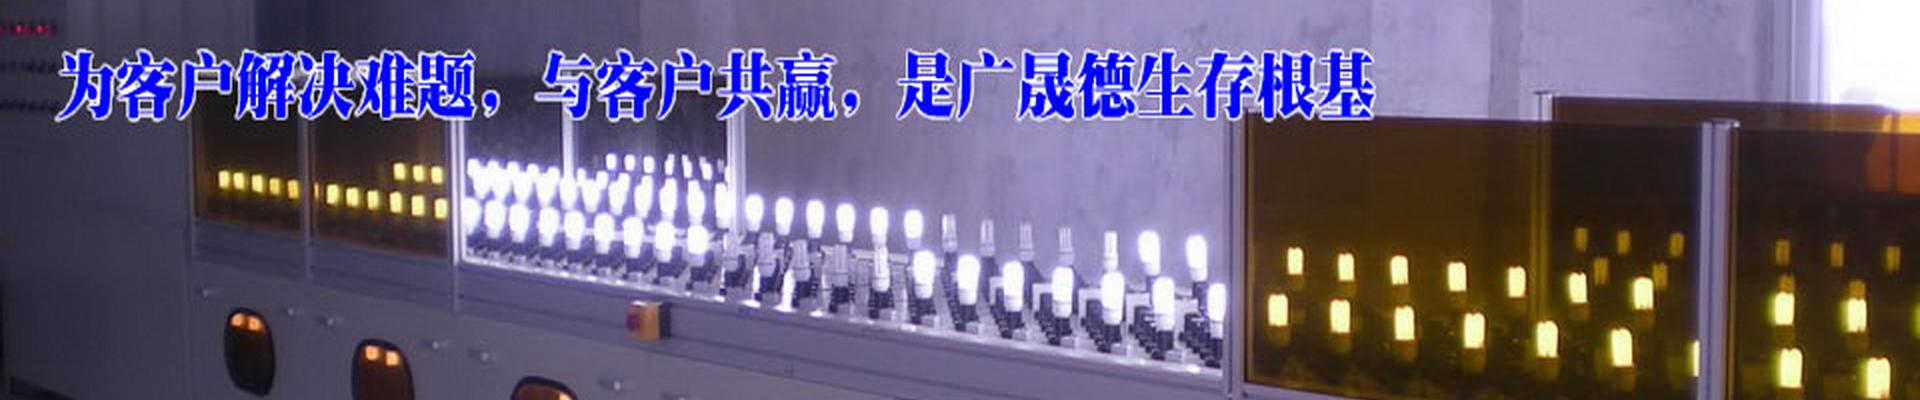 LED球泡灯老化线